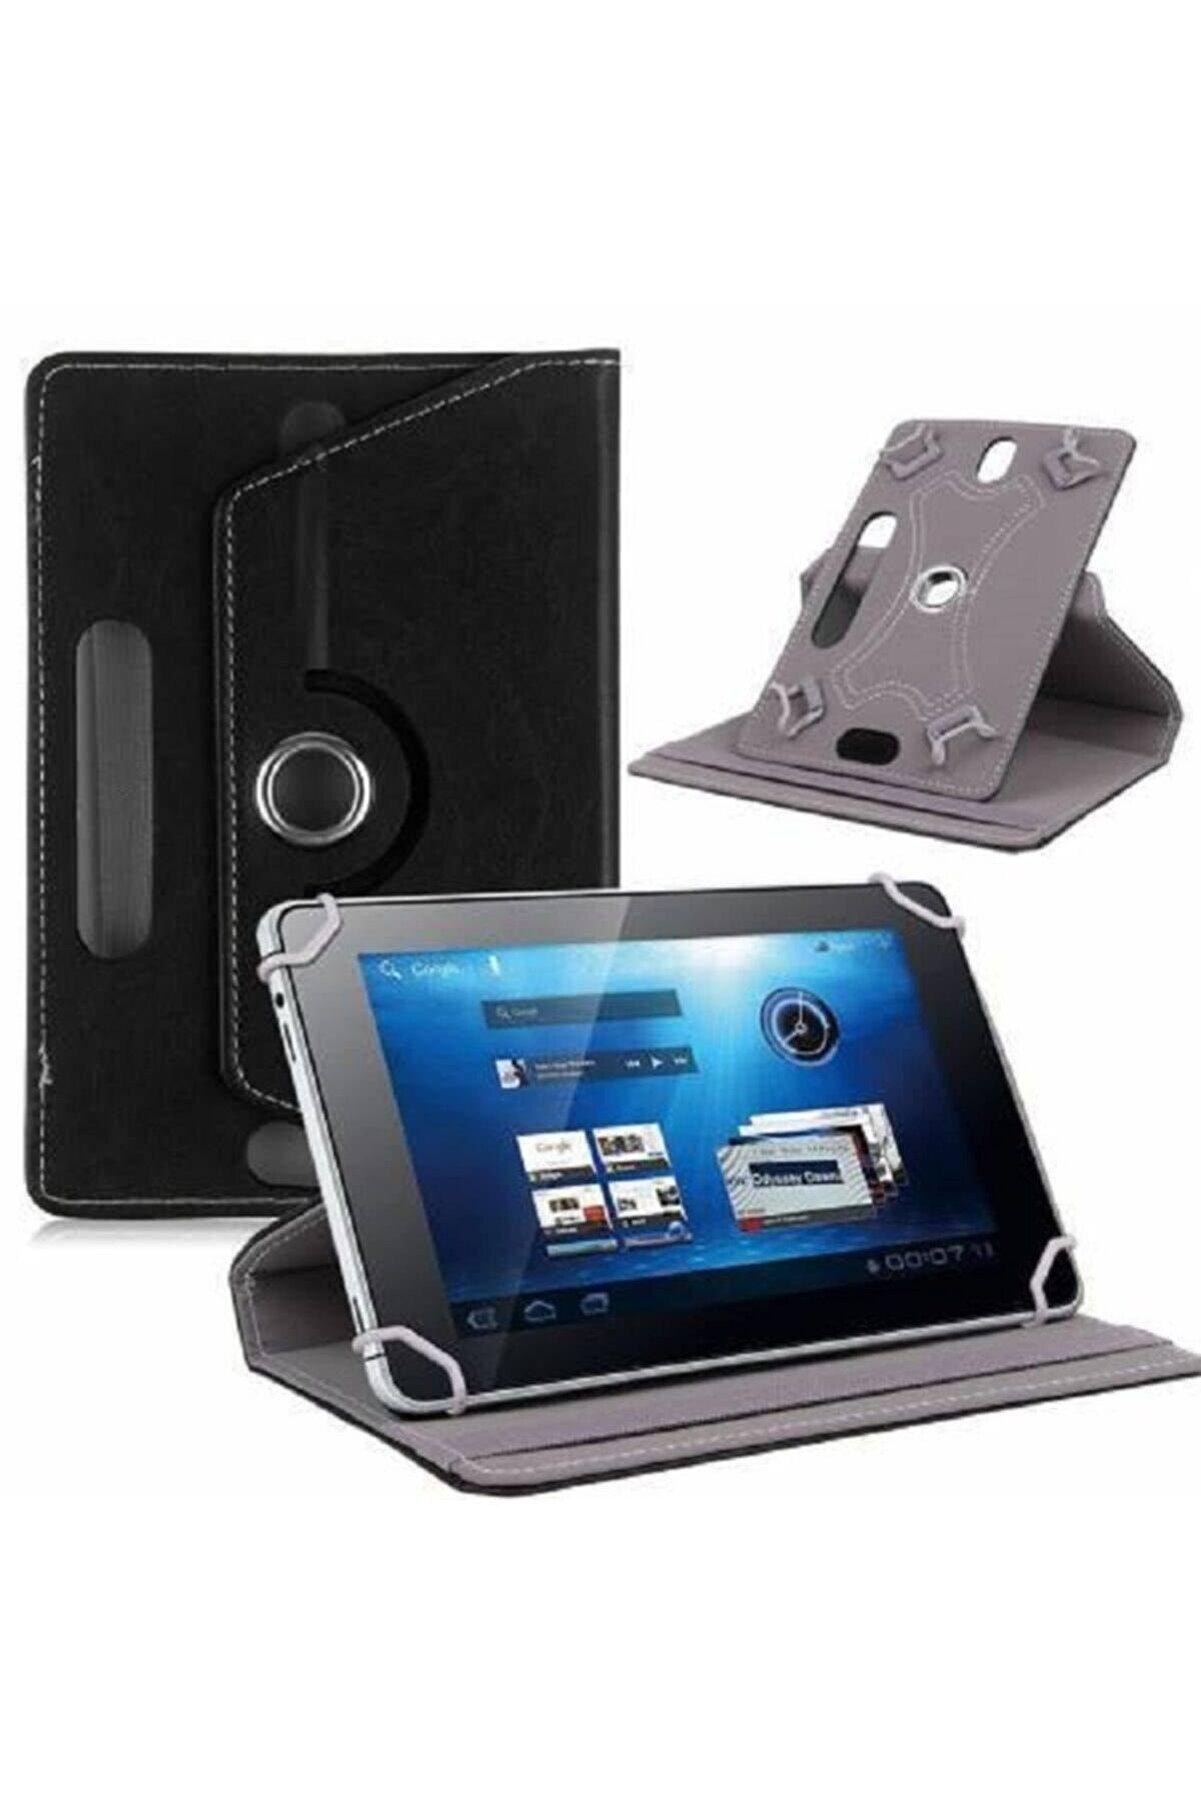 SİRİUS Vorcom Sx Pro 10.1'' Uyumlu Üniversal Dönerli Satandlı Siyah Renk Tablet Kılıfı